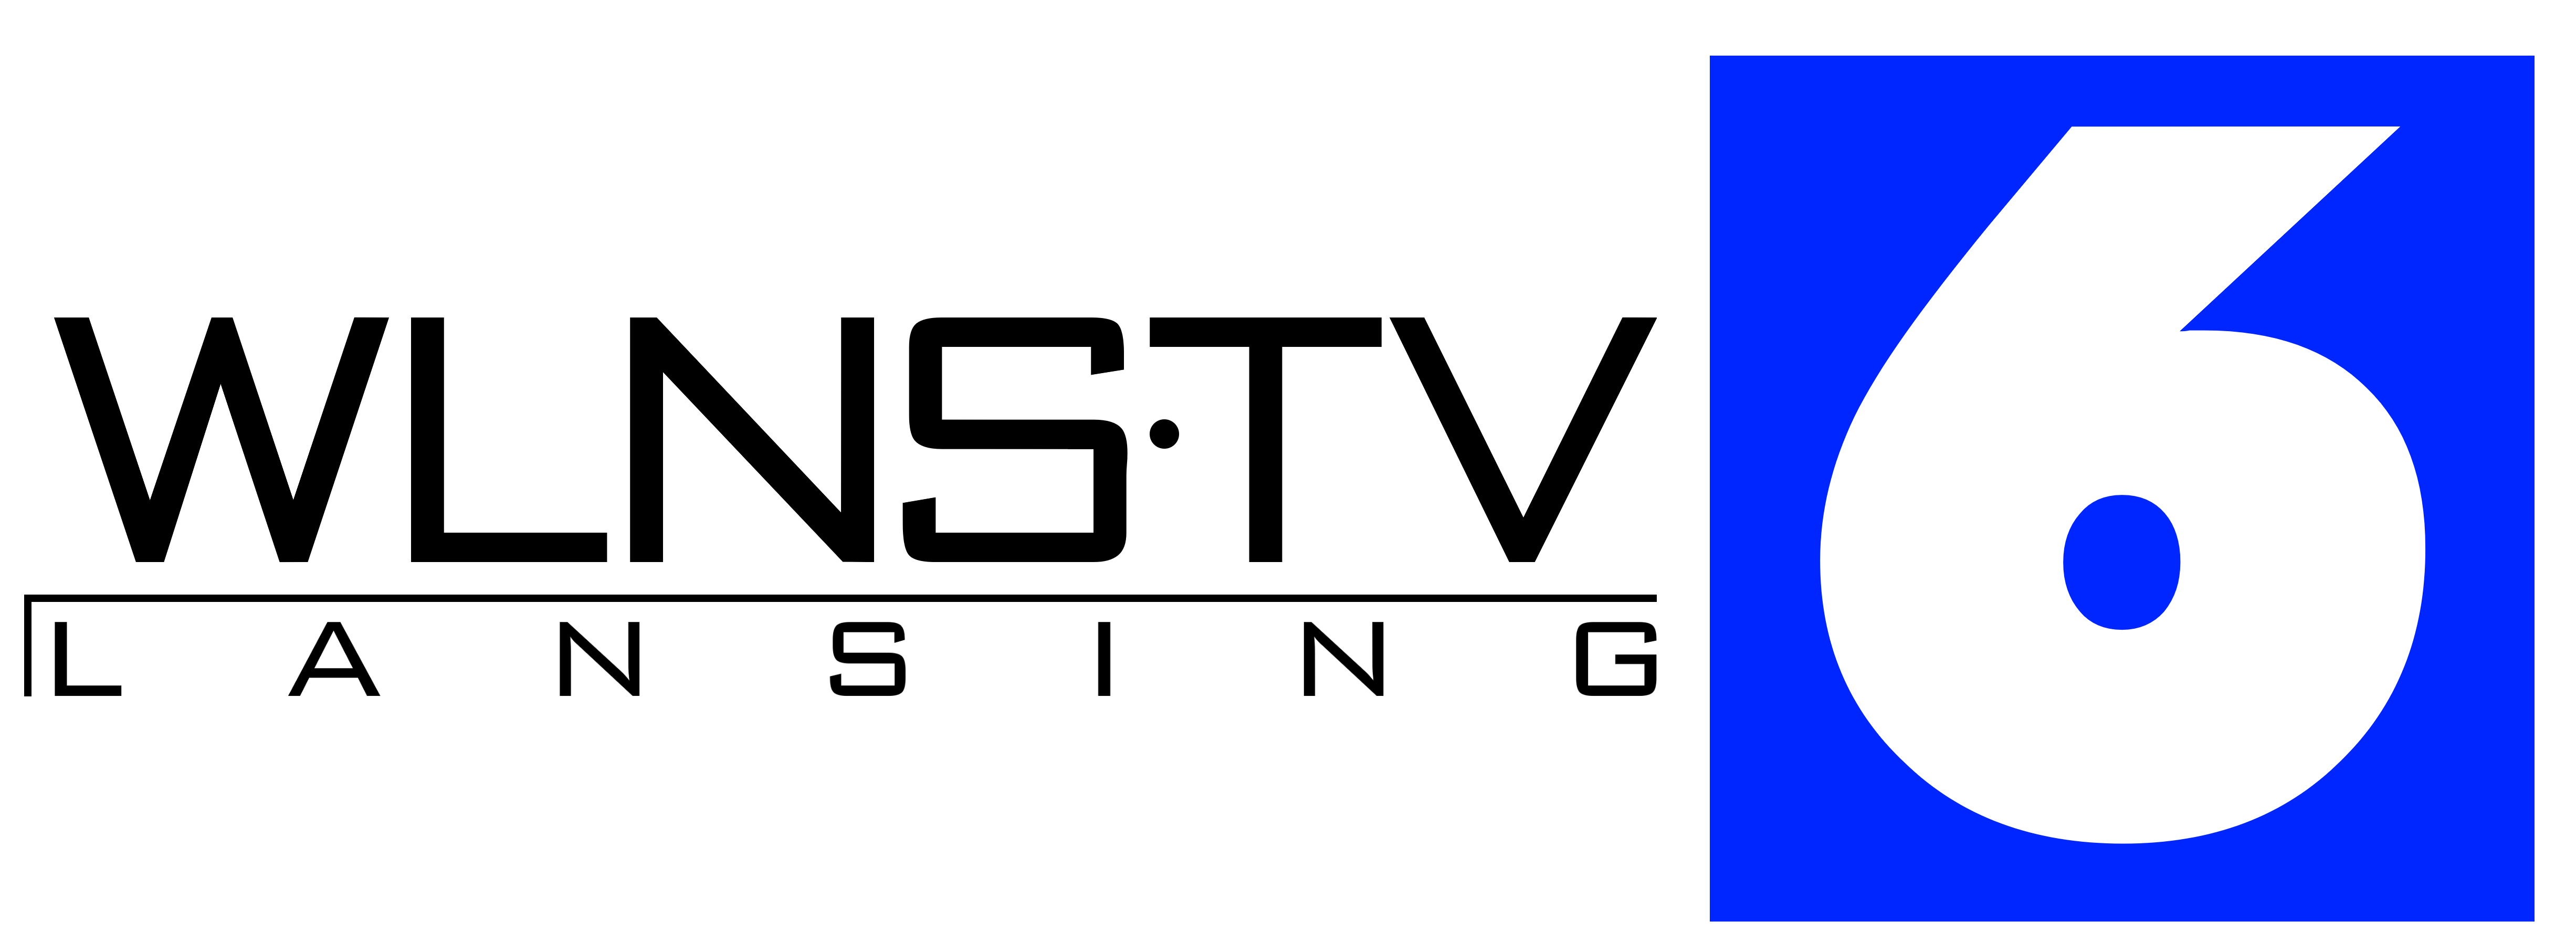 AlternateHistory.com's WLNS logo #1.png